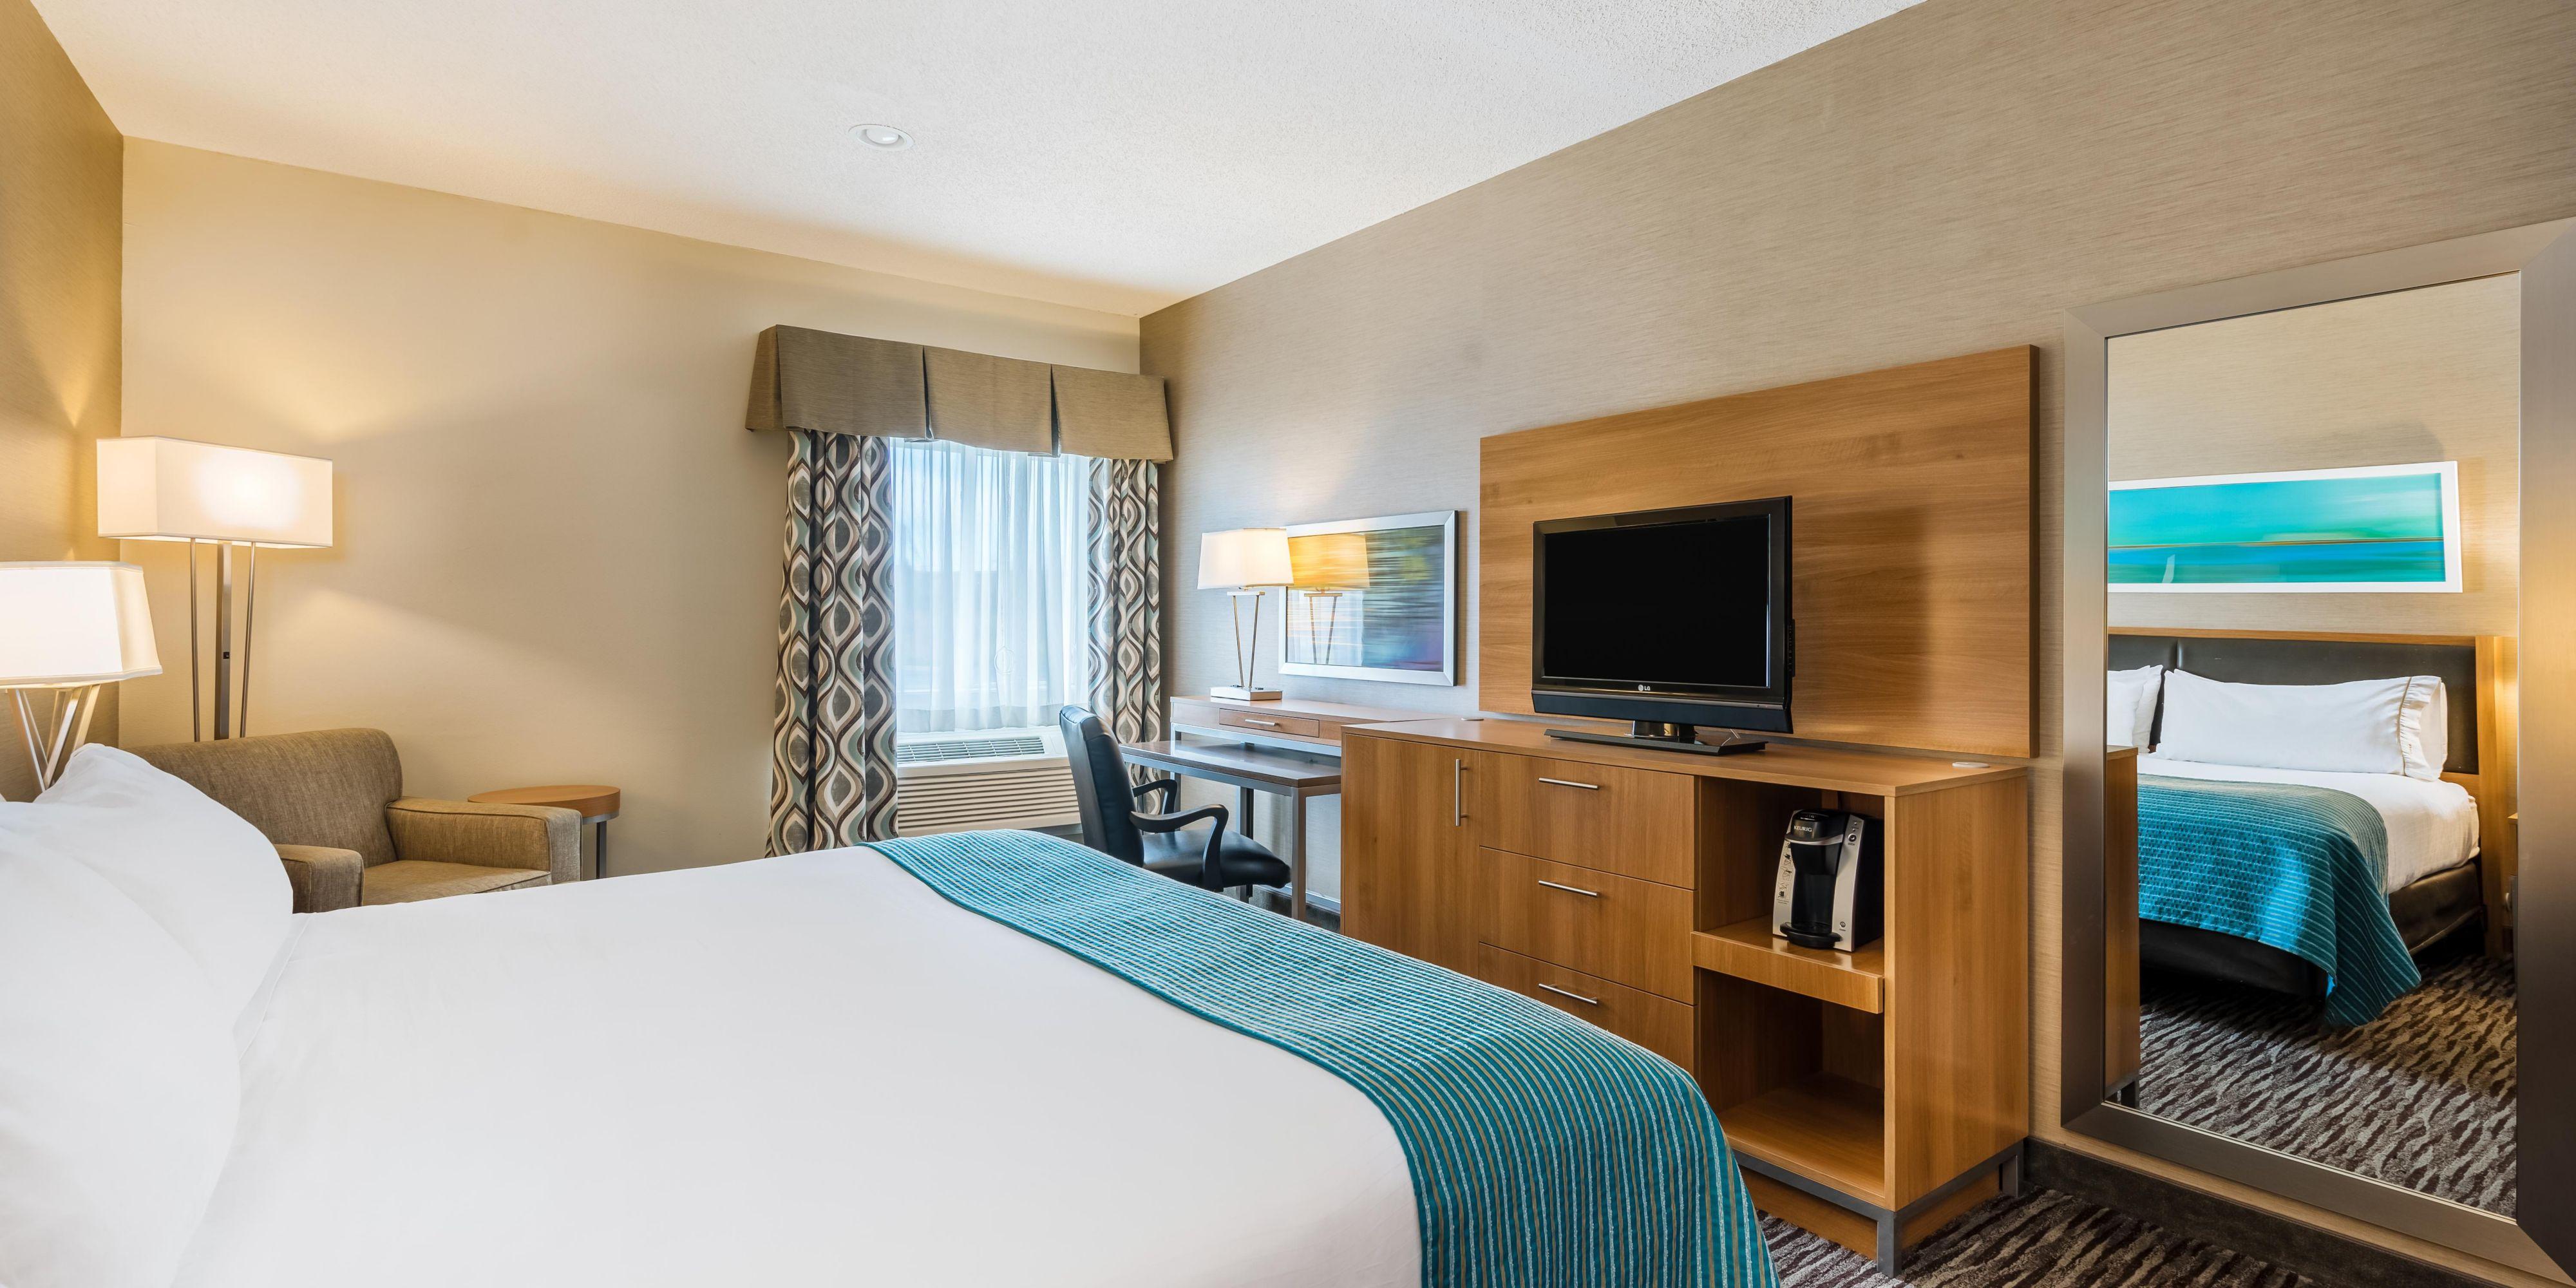 Holiday Inn Express Grasonville 5019762806 2x1